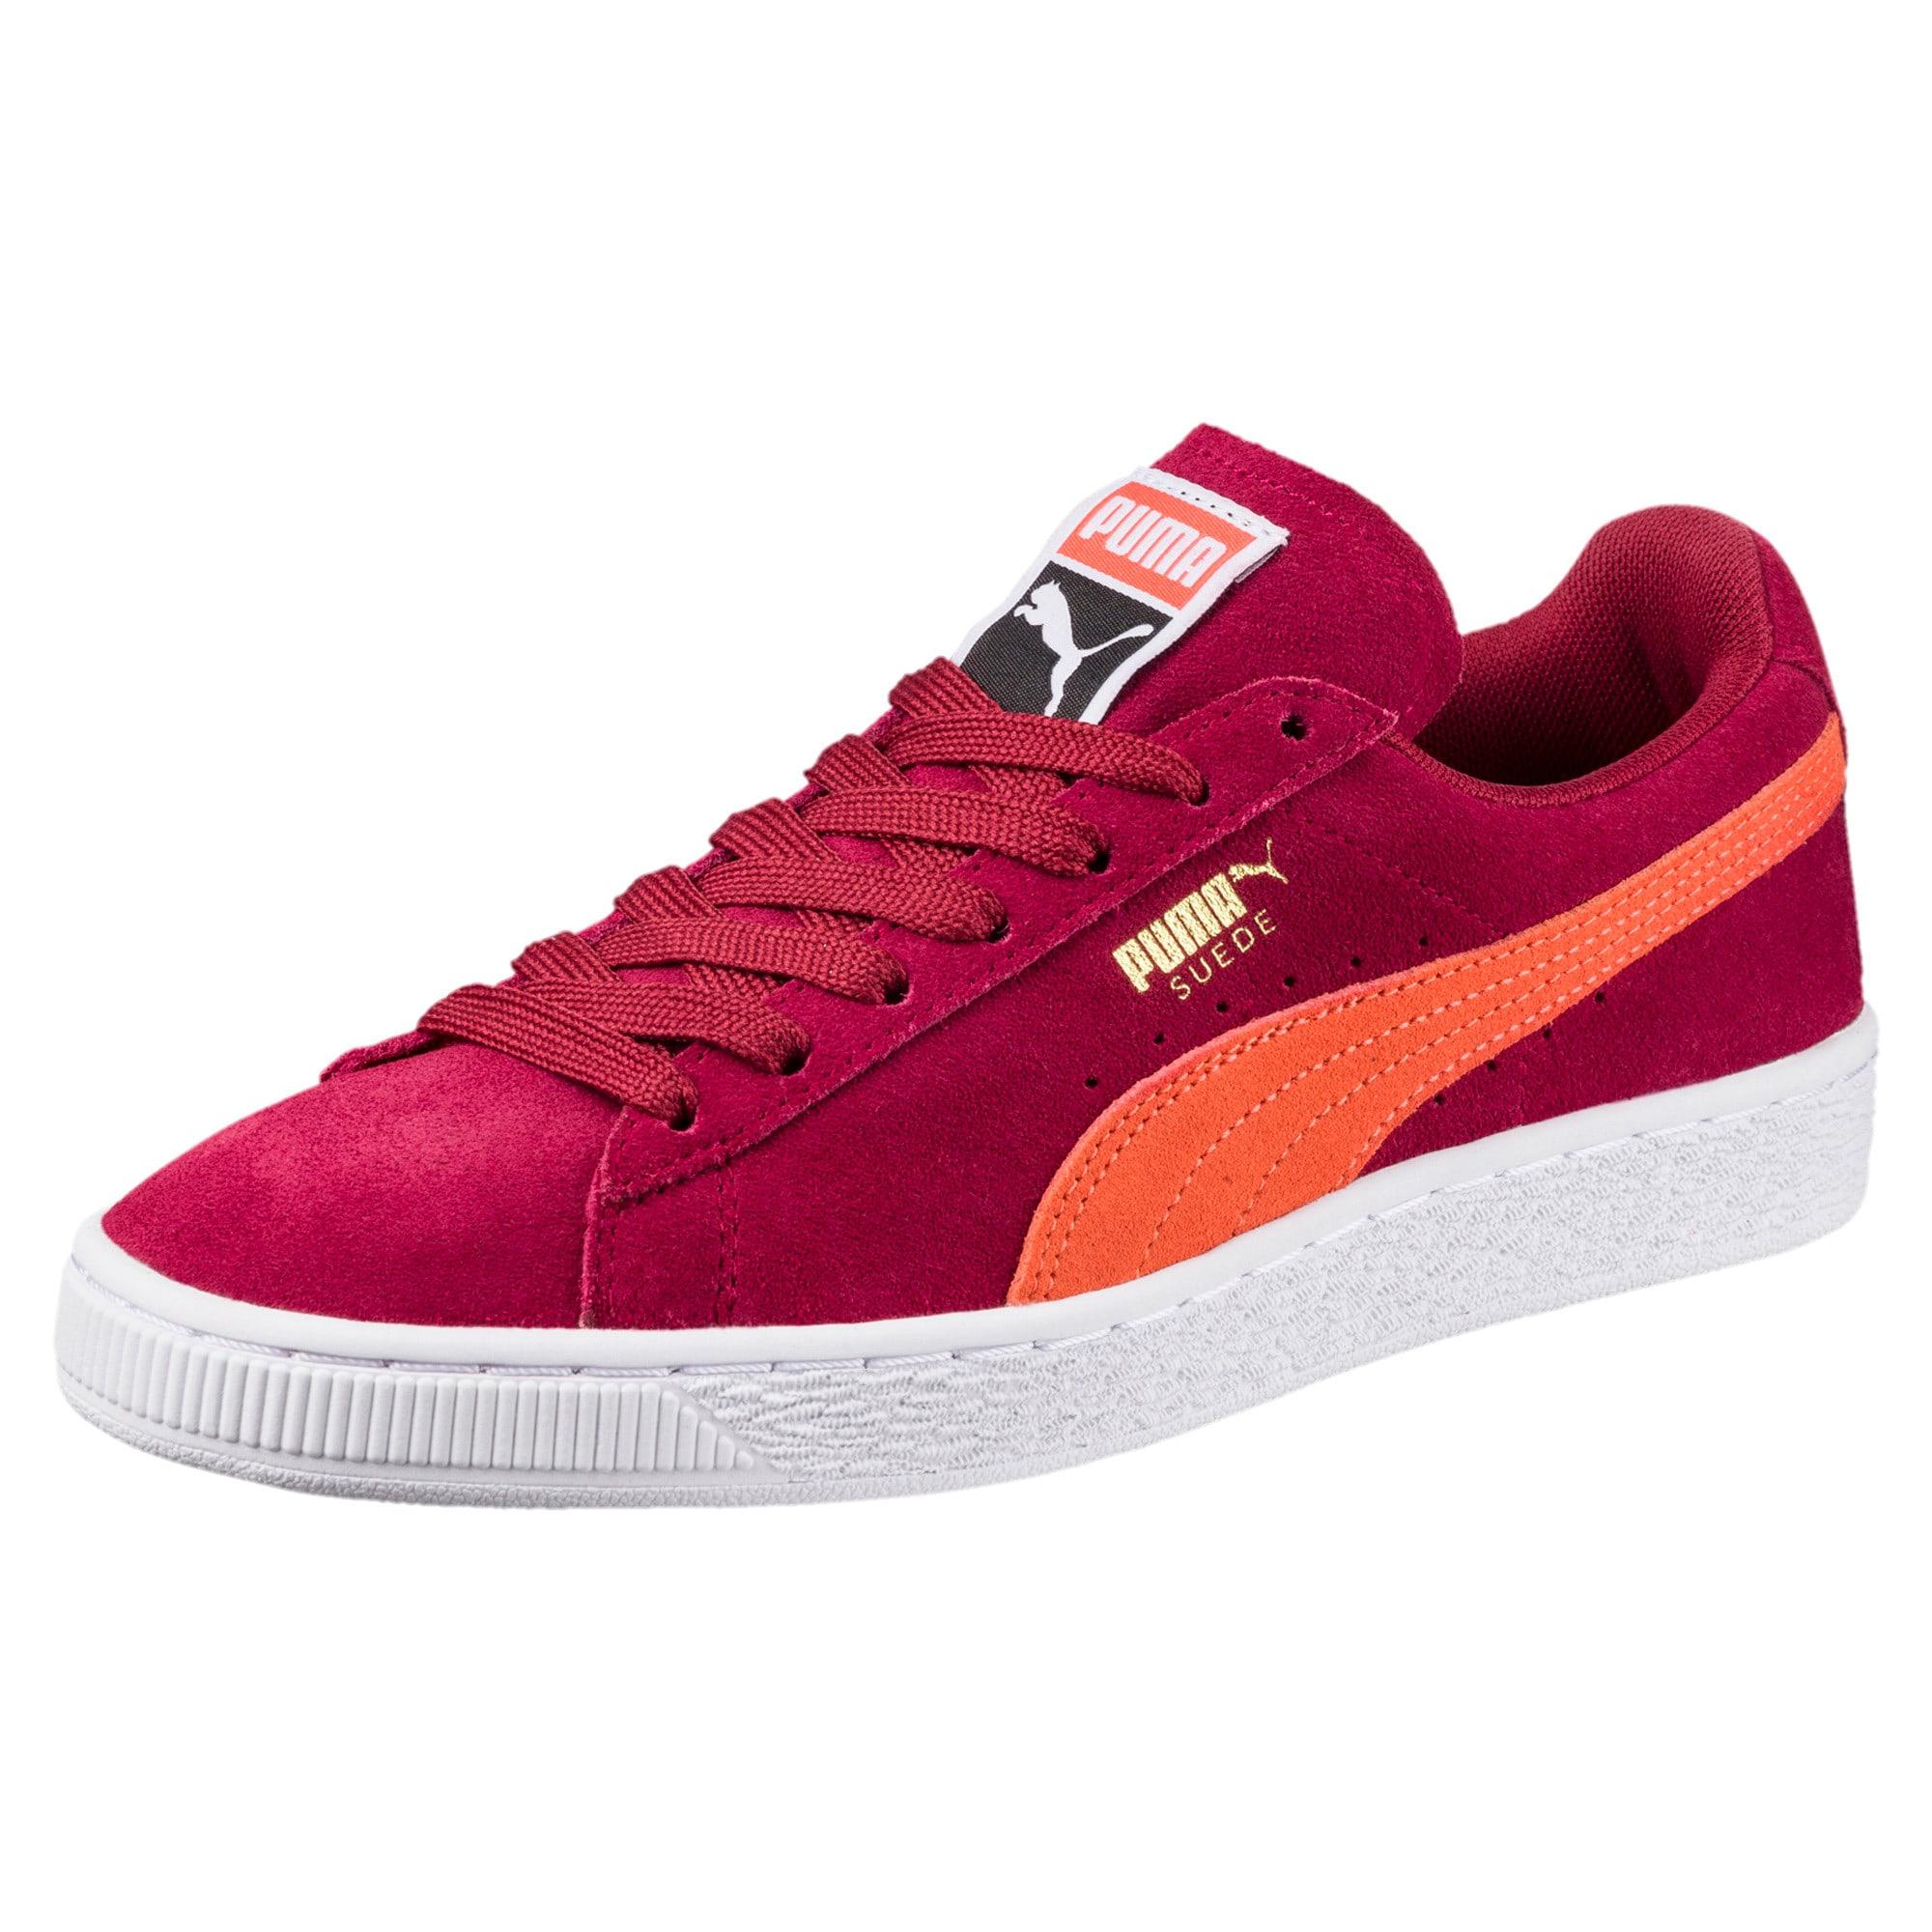 Thumbnail 1 of Suede Classic Women's Sneakers, Tibetan Red-Hot Coral, medium